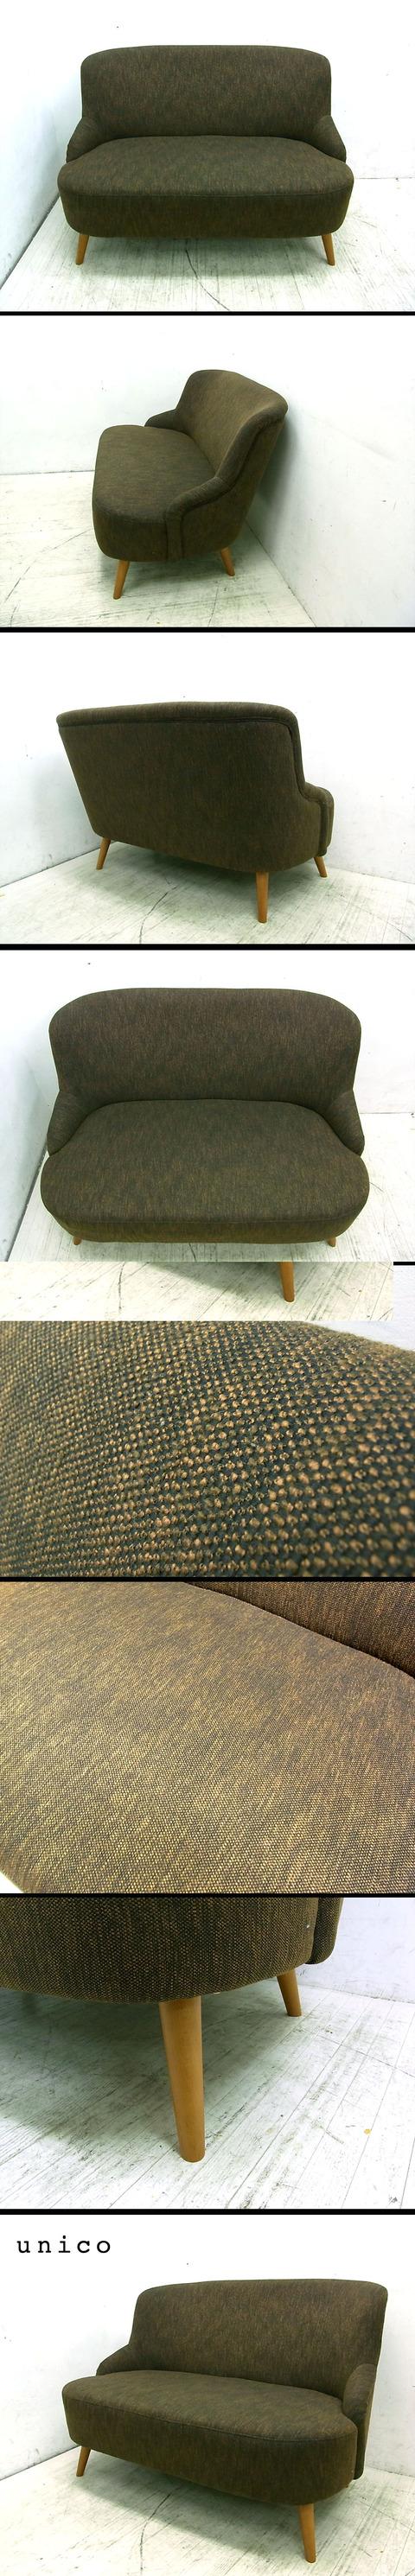 unico sophi 2p sofa 2015 06 27 2